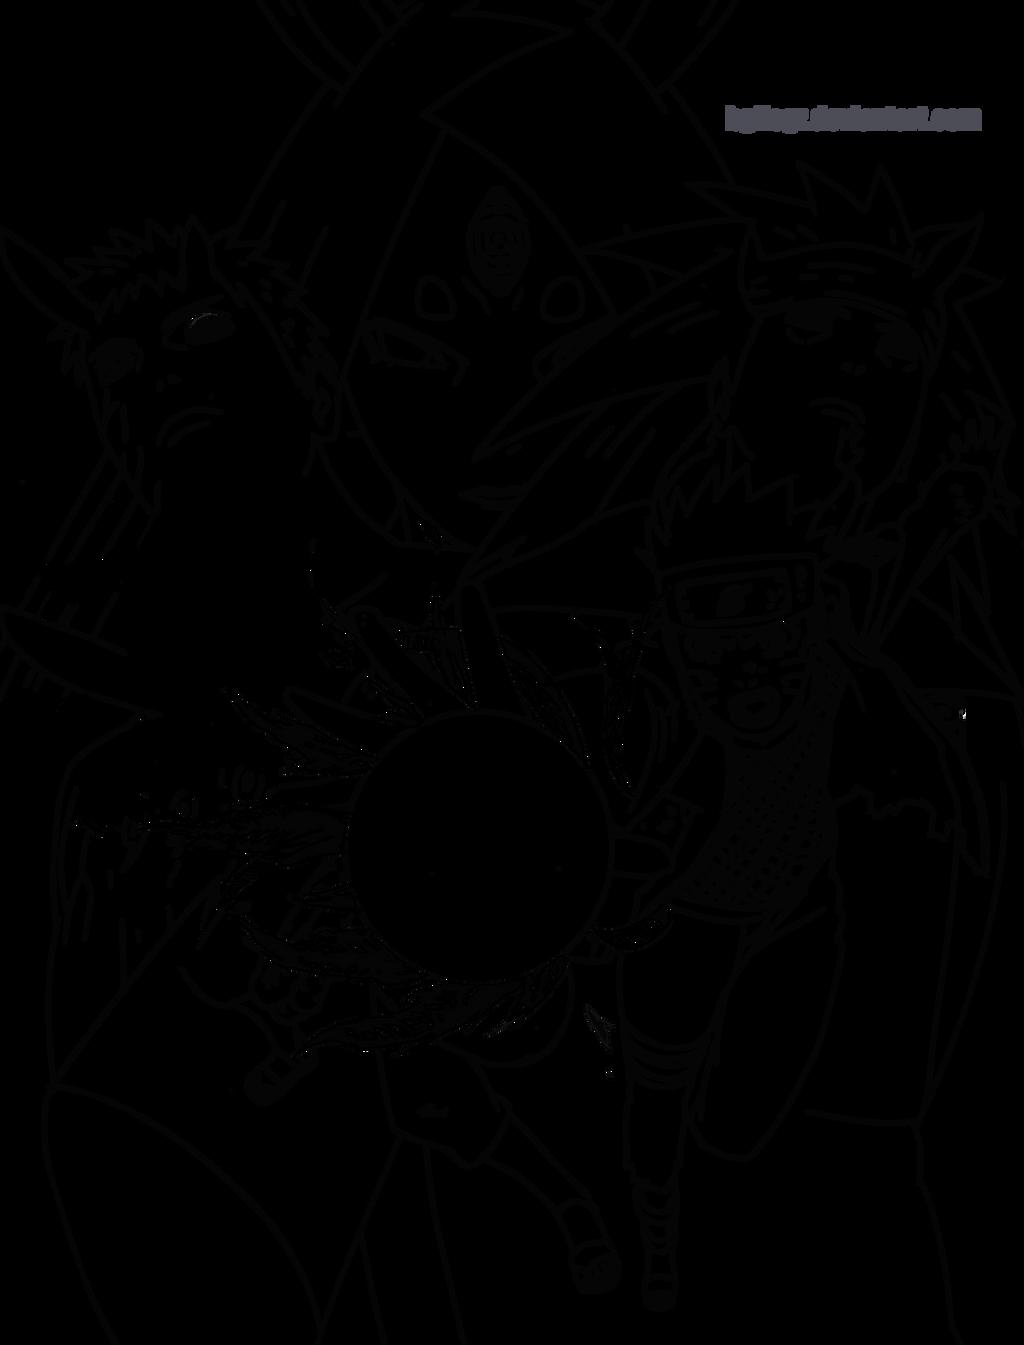 Lineart Naruto : Naruto storm lineart by bgflegz on deviantart